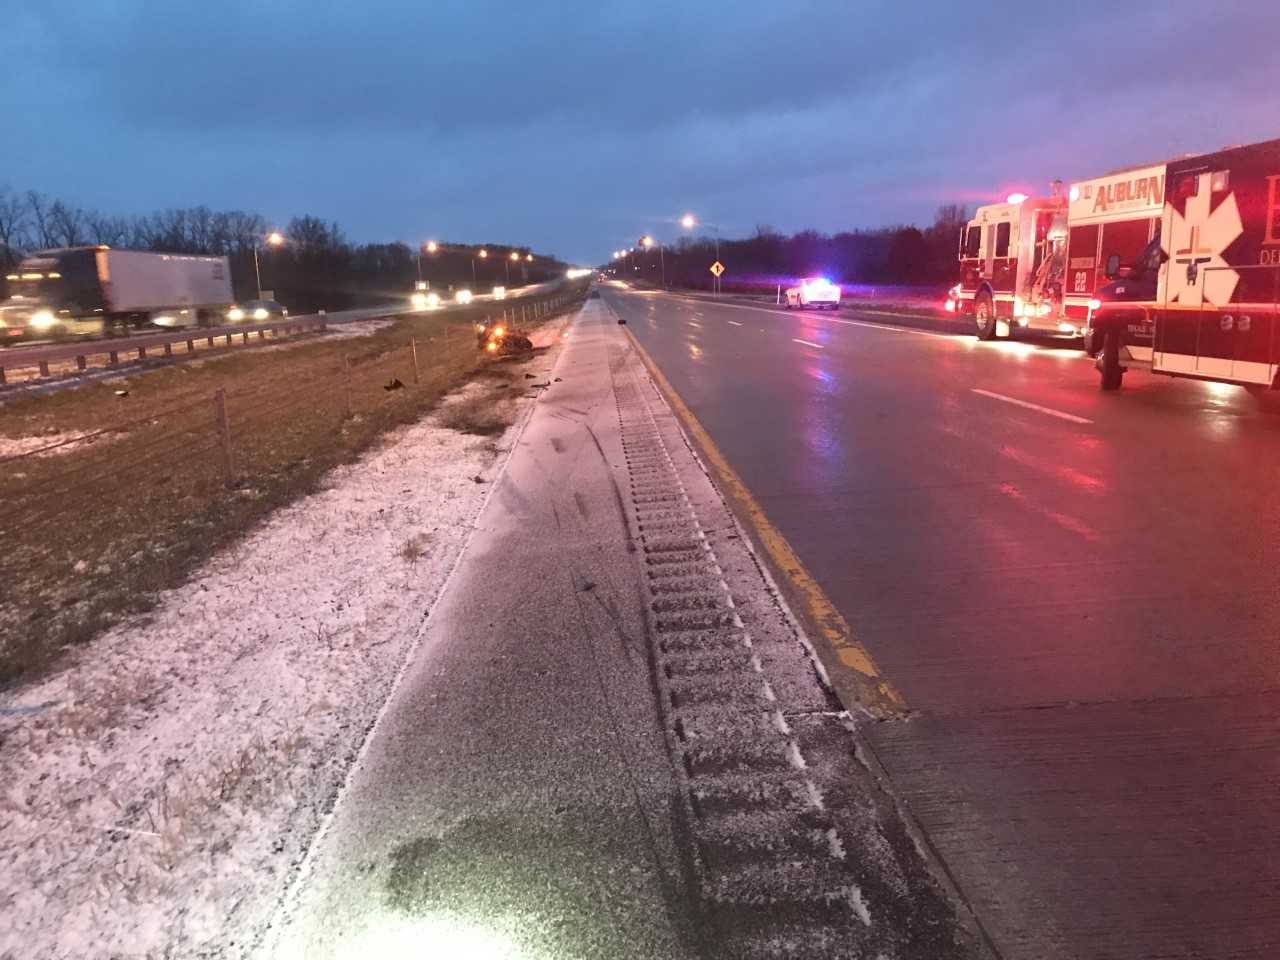 69 motorcycle crash icy road